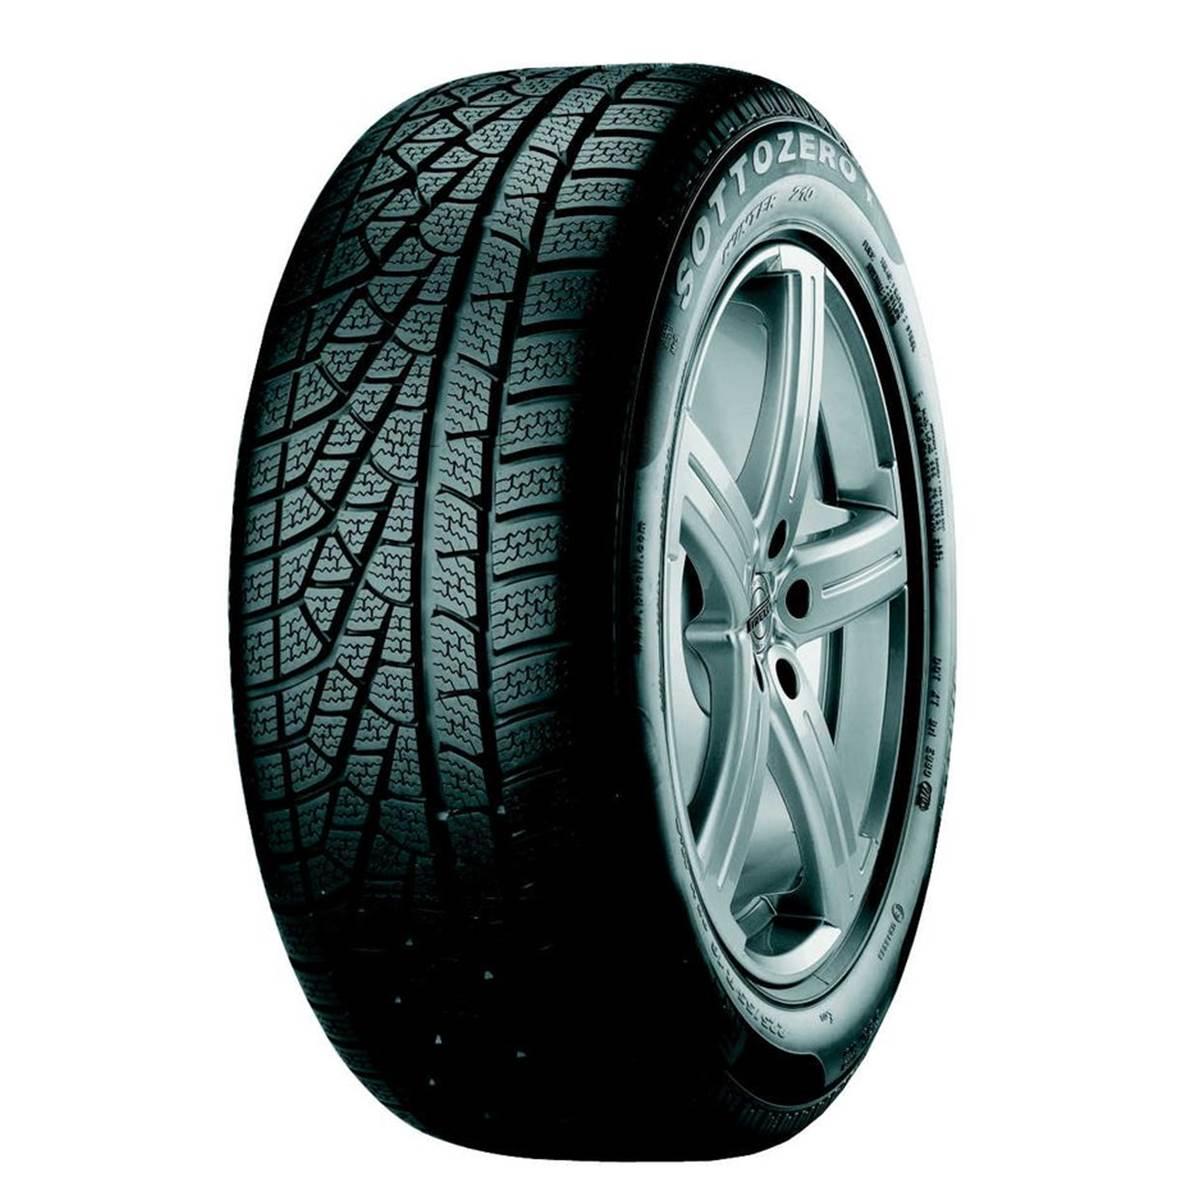 Pneu Runflat Hiver Pirelli 225/45R17 91H Winter Sottozero 3